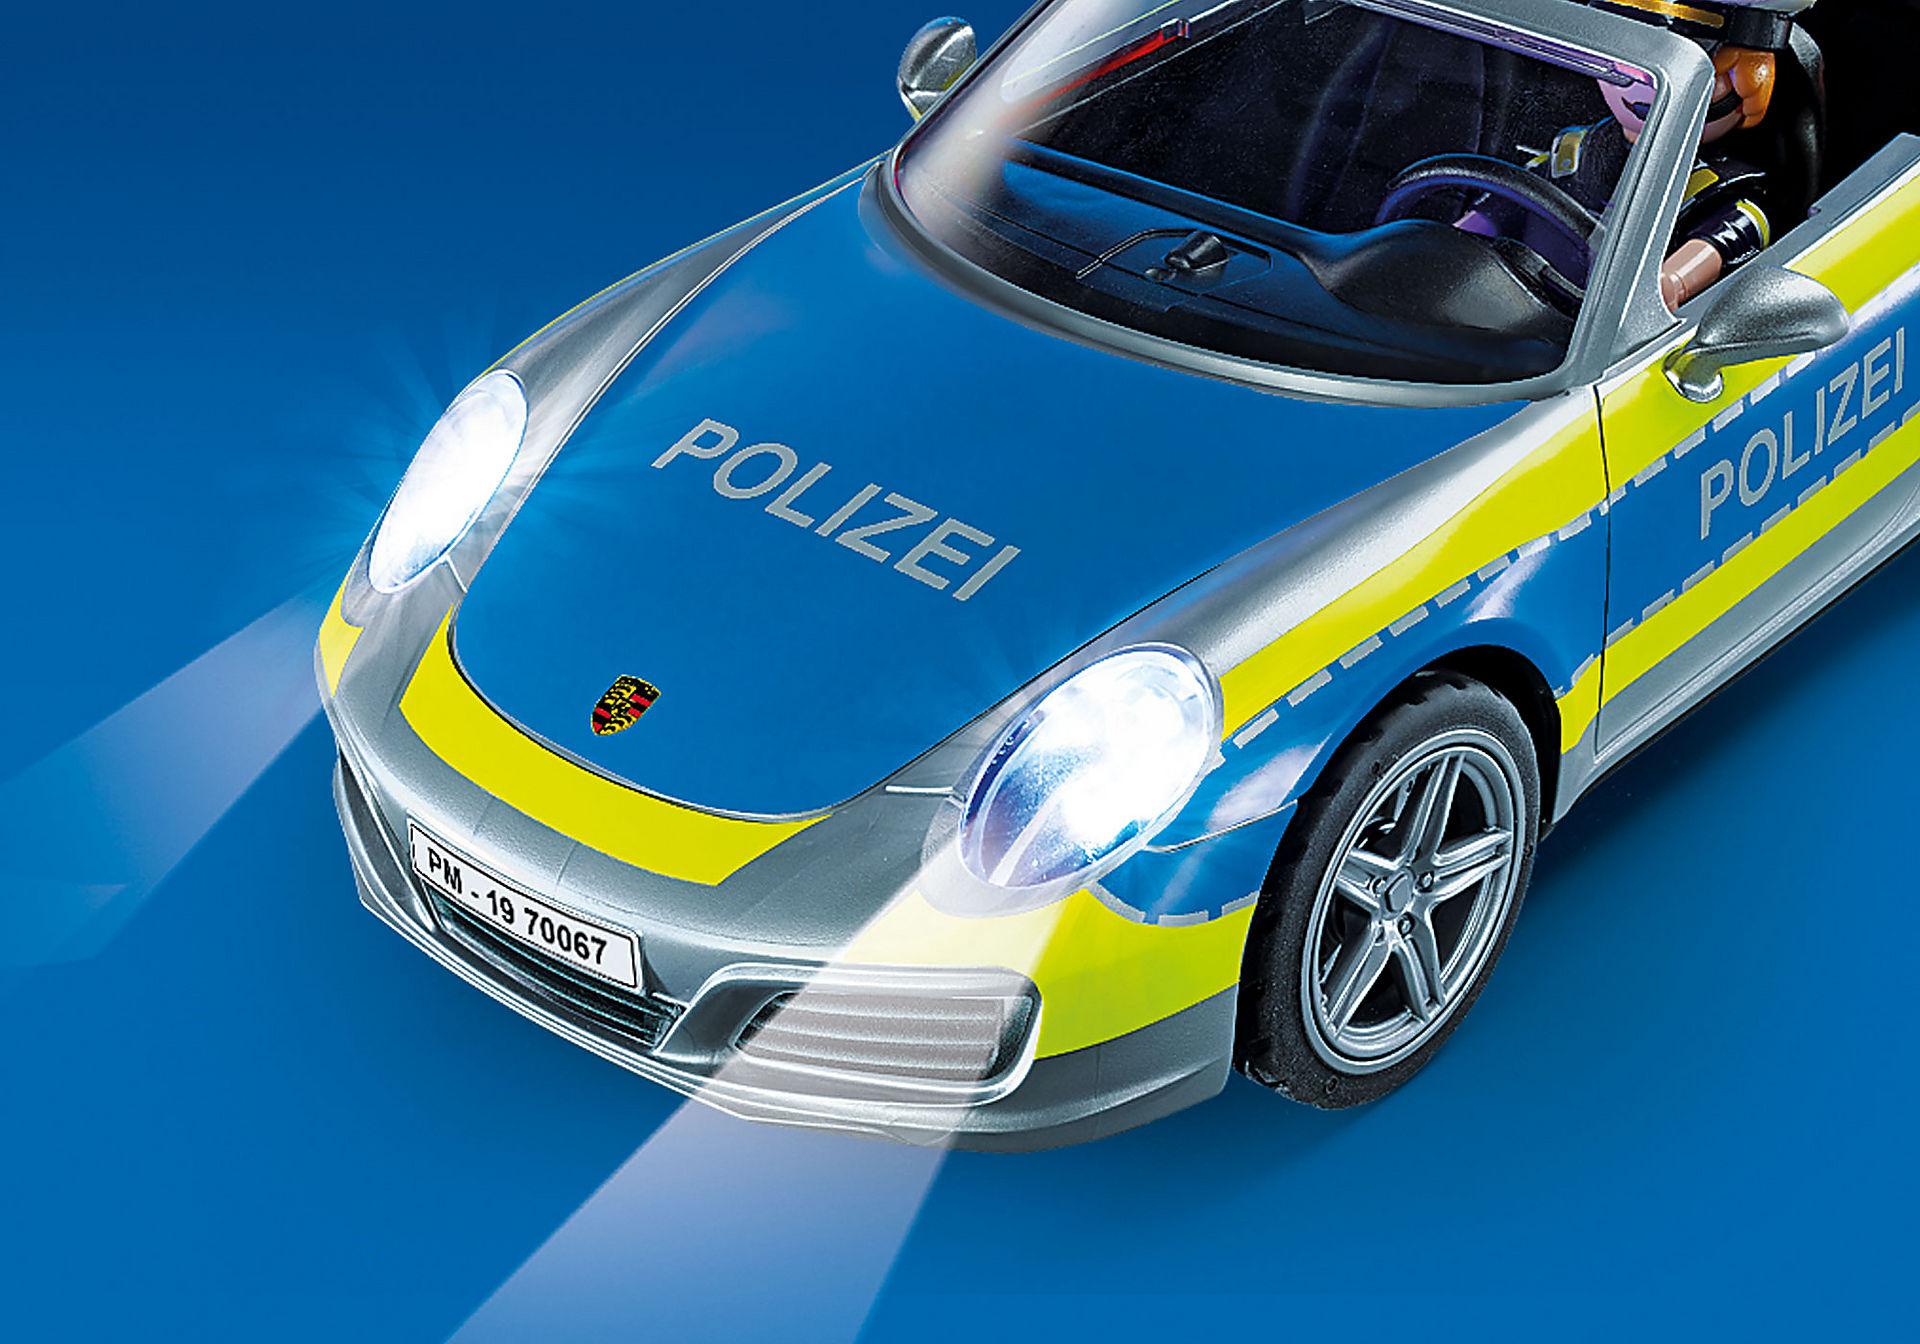 70067 Porsche 911 Carrera 4S Police zoom image5